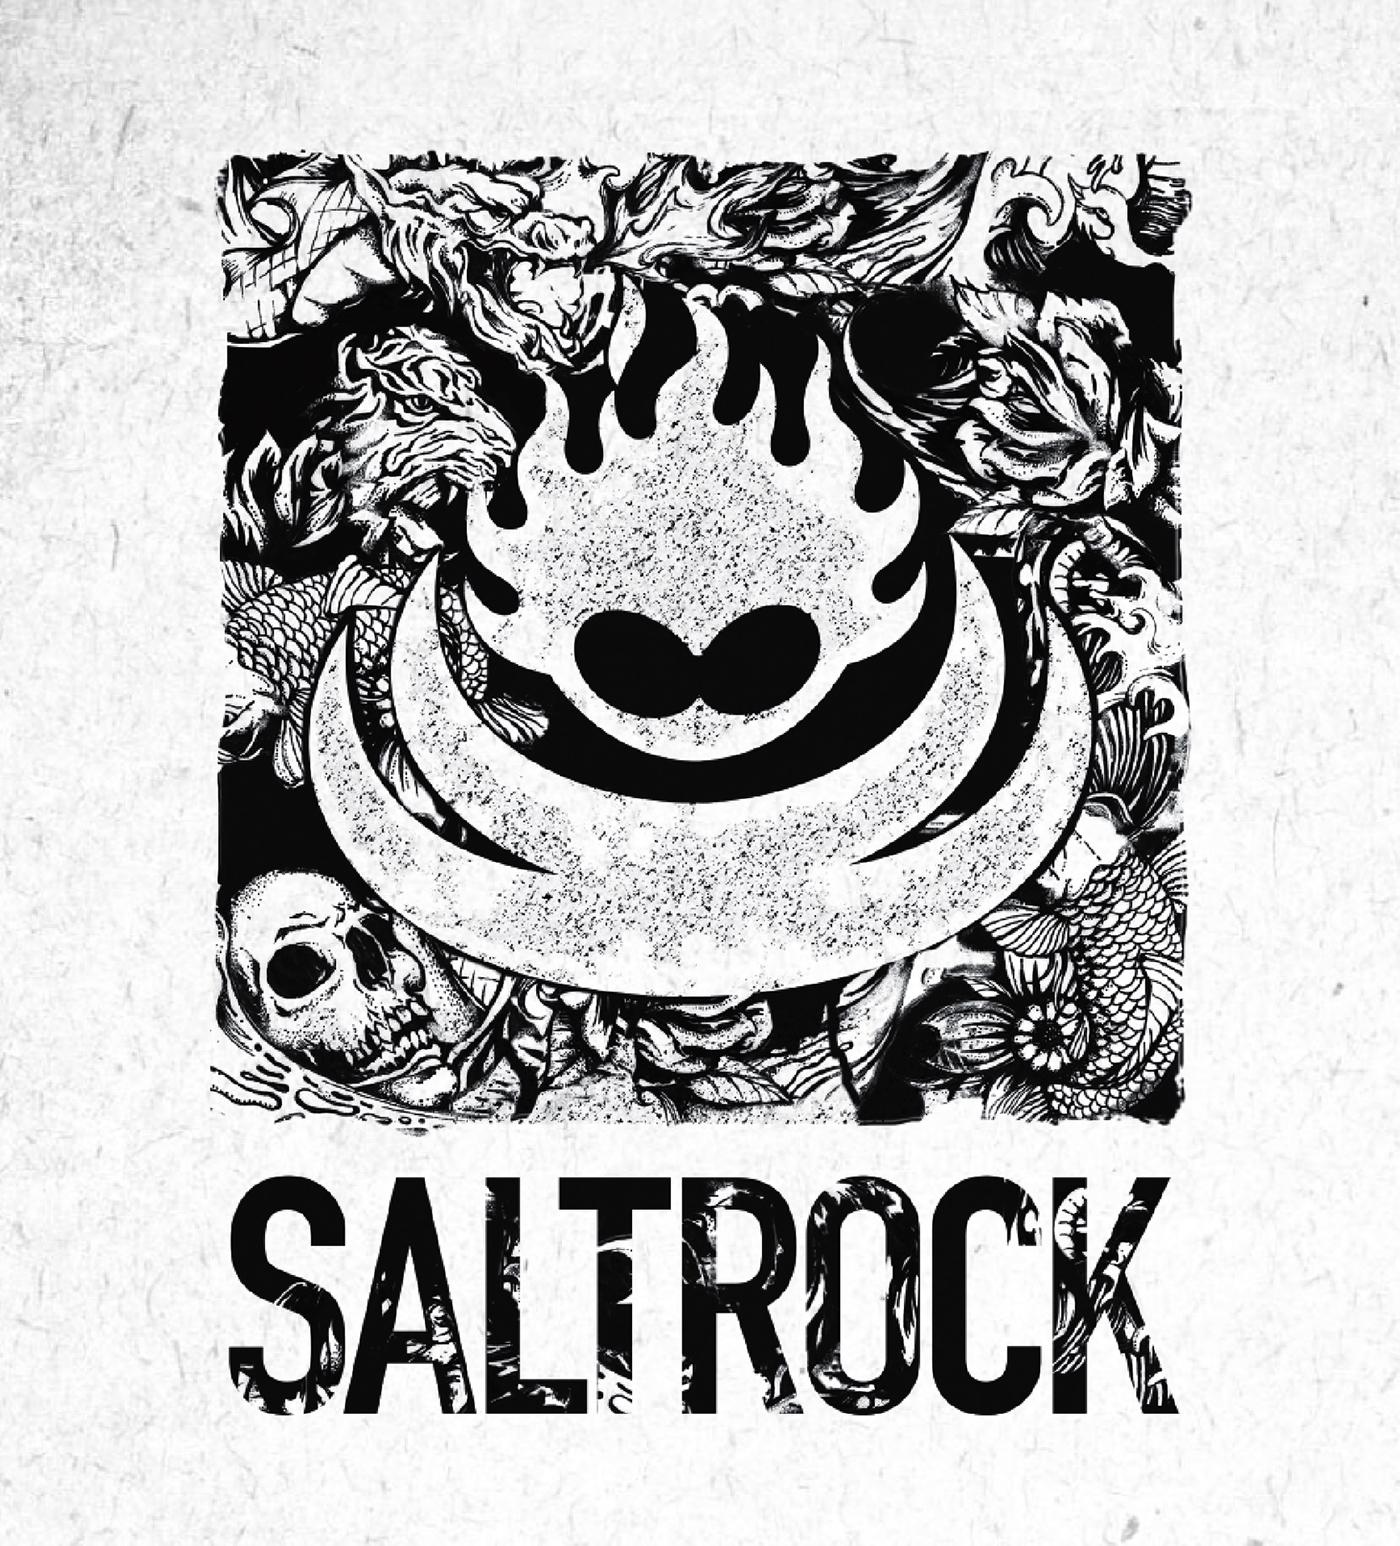 Saltrock Corp Tee Prints On Behance